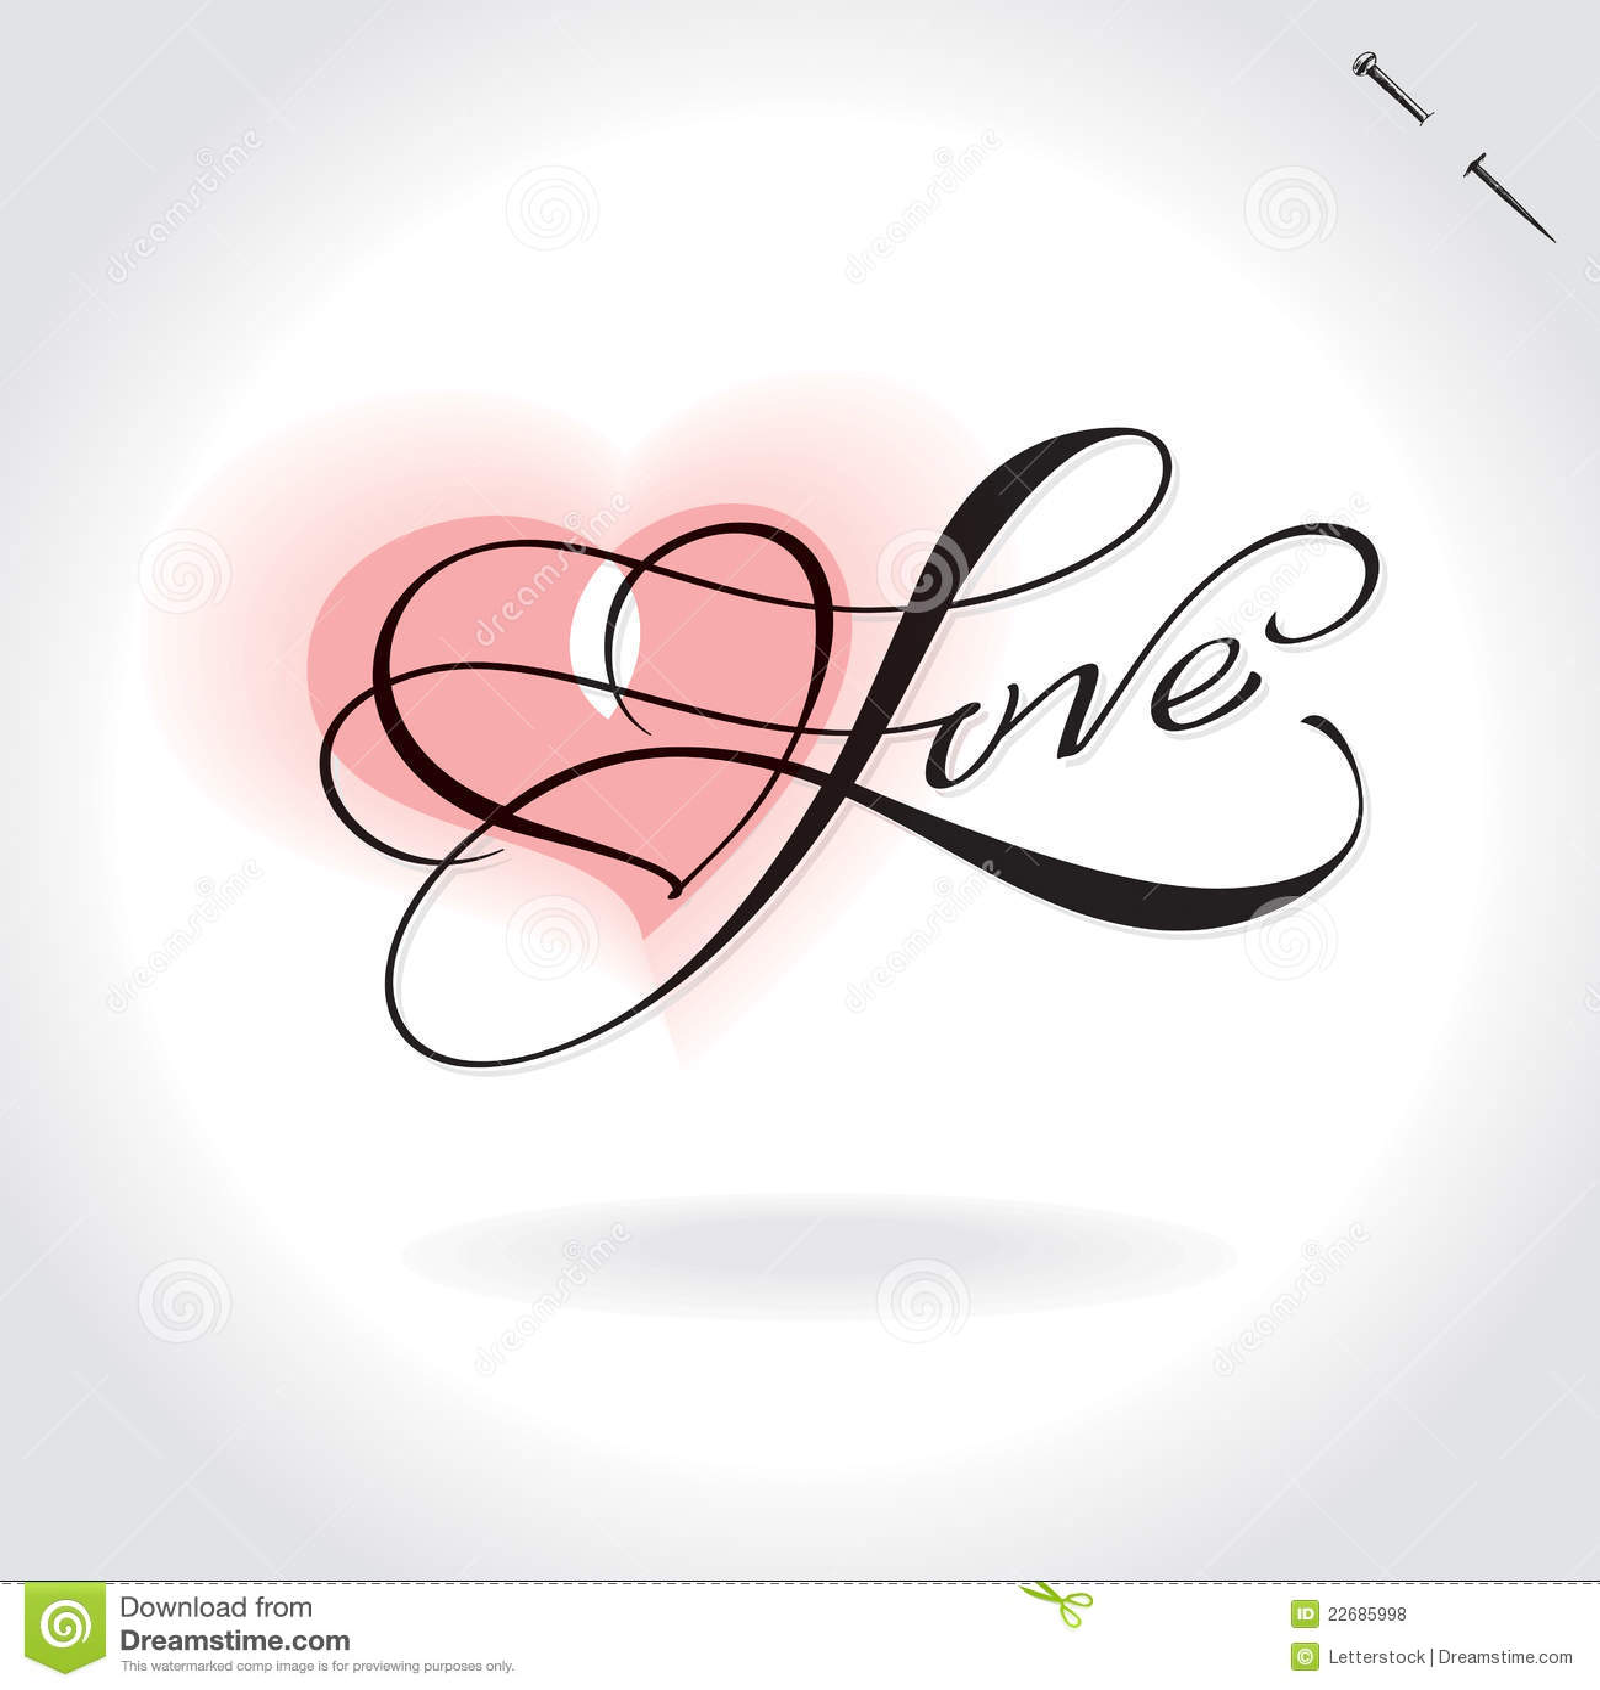 Love English Calligraphy Love hand lettering - handmade